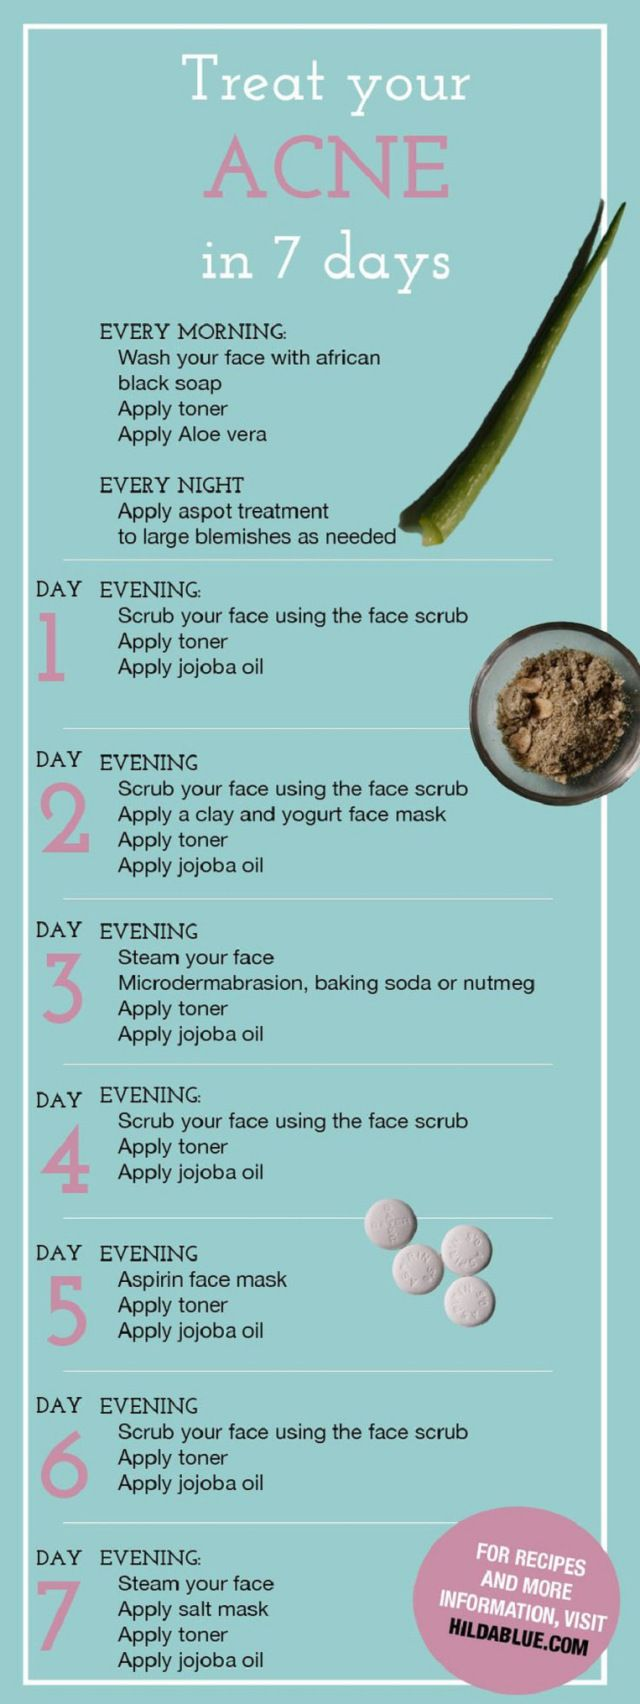 15 Ultimate Clear Skin Tips, Tricks and DIYs   JexShop Blog